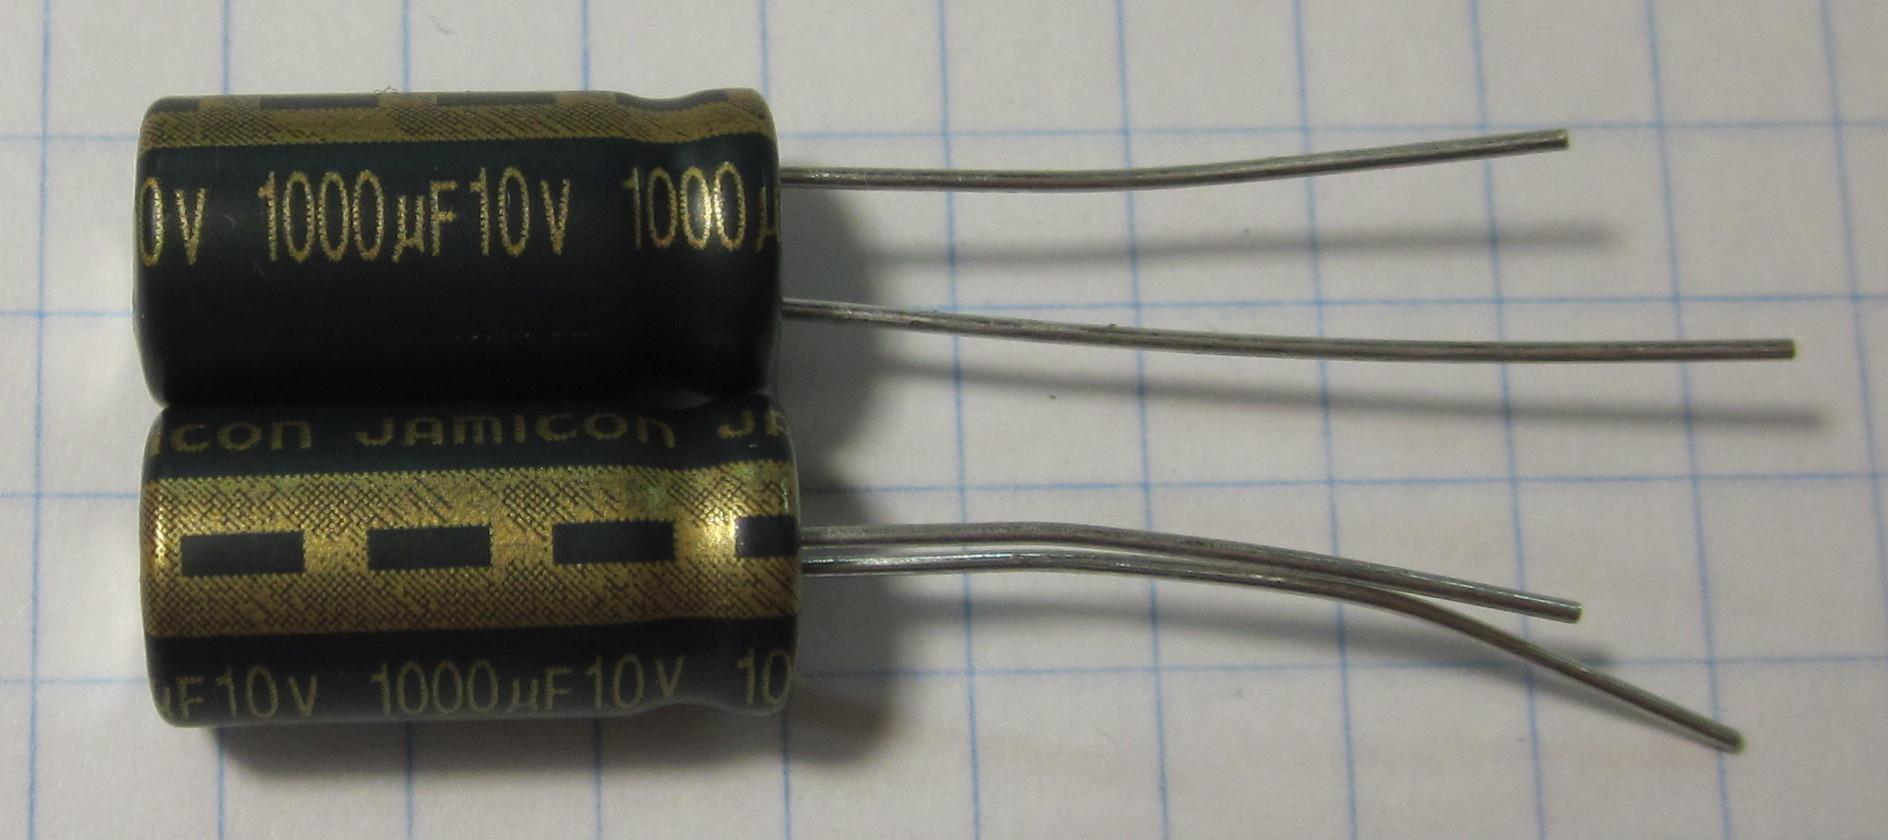 1000,0x10V 8x16